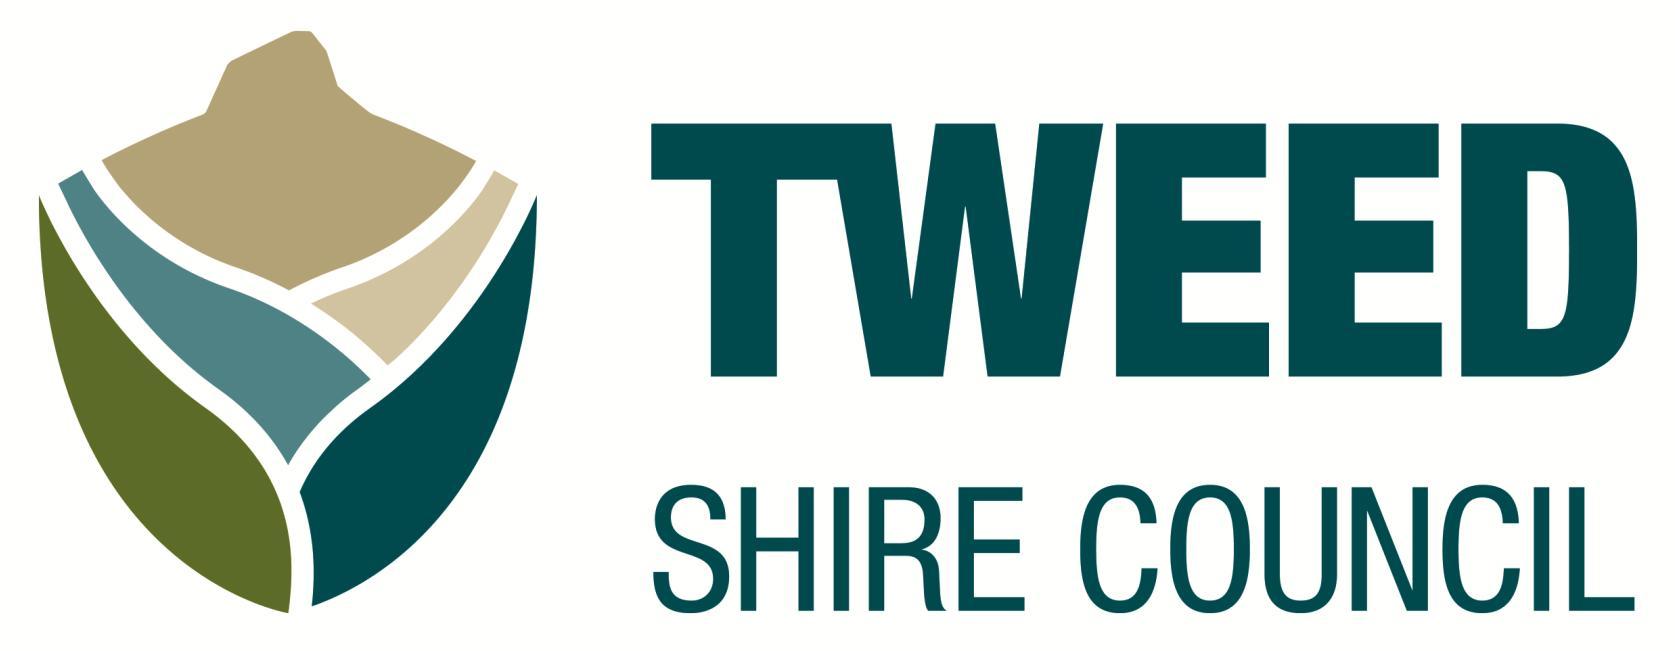 tweed-shire-council